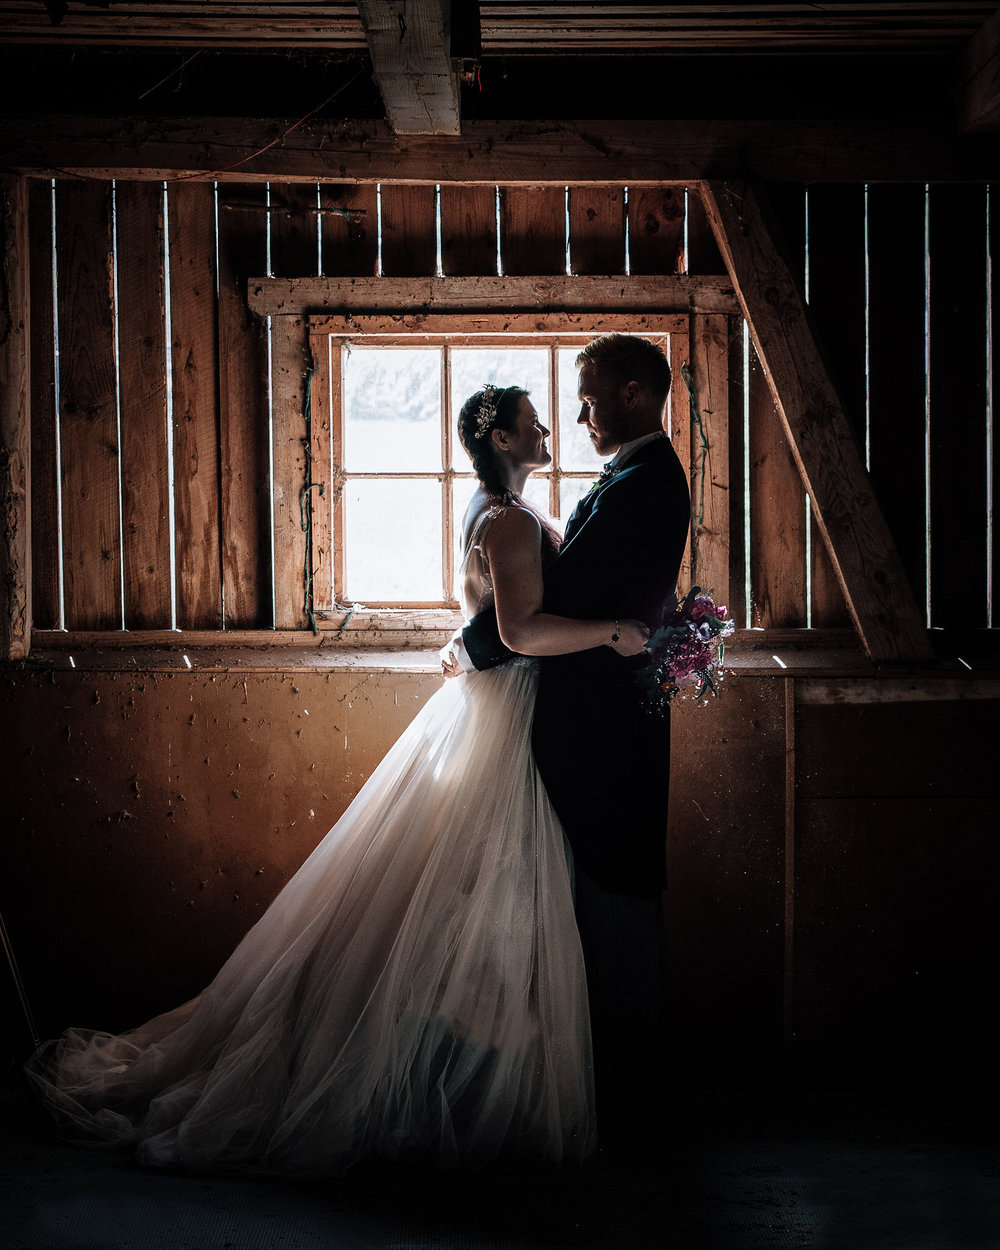 750_3681-Edit-fotograf-vestfold-bryllupsfotograf-.jpg